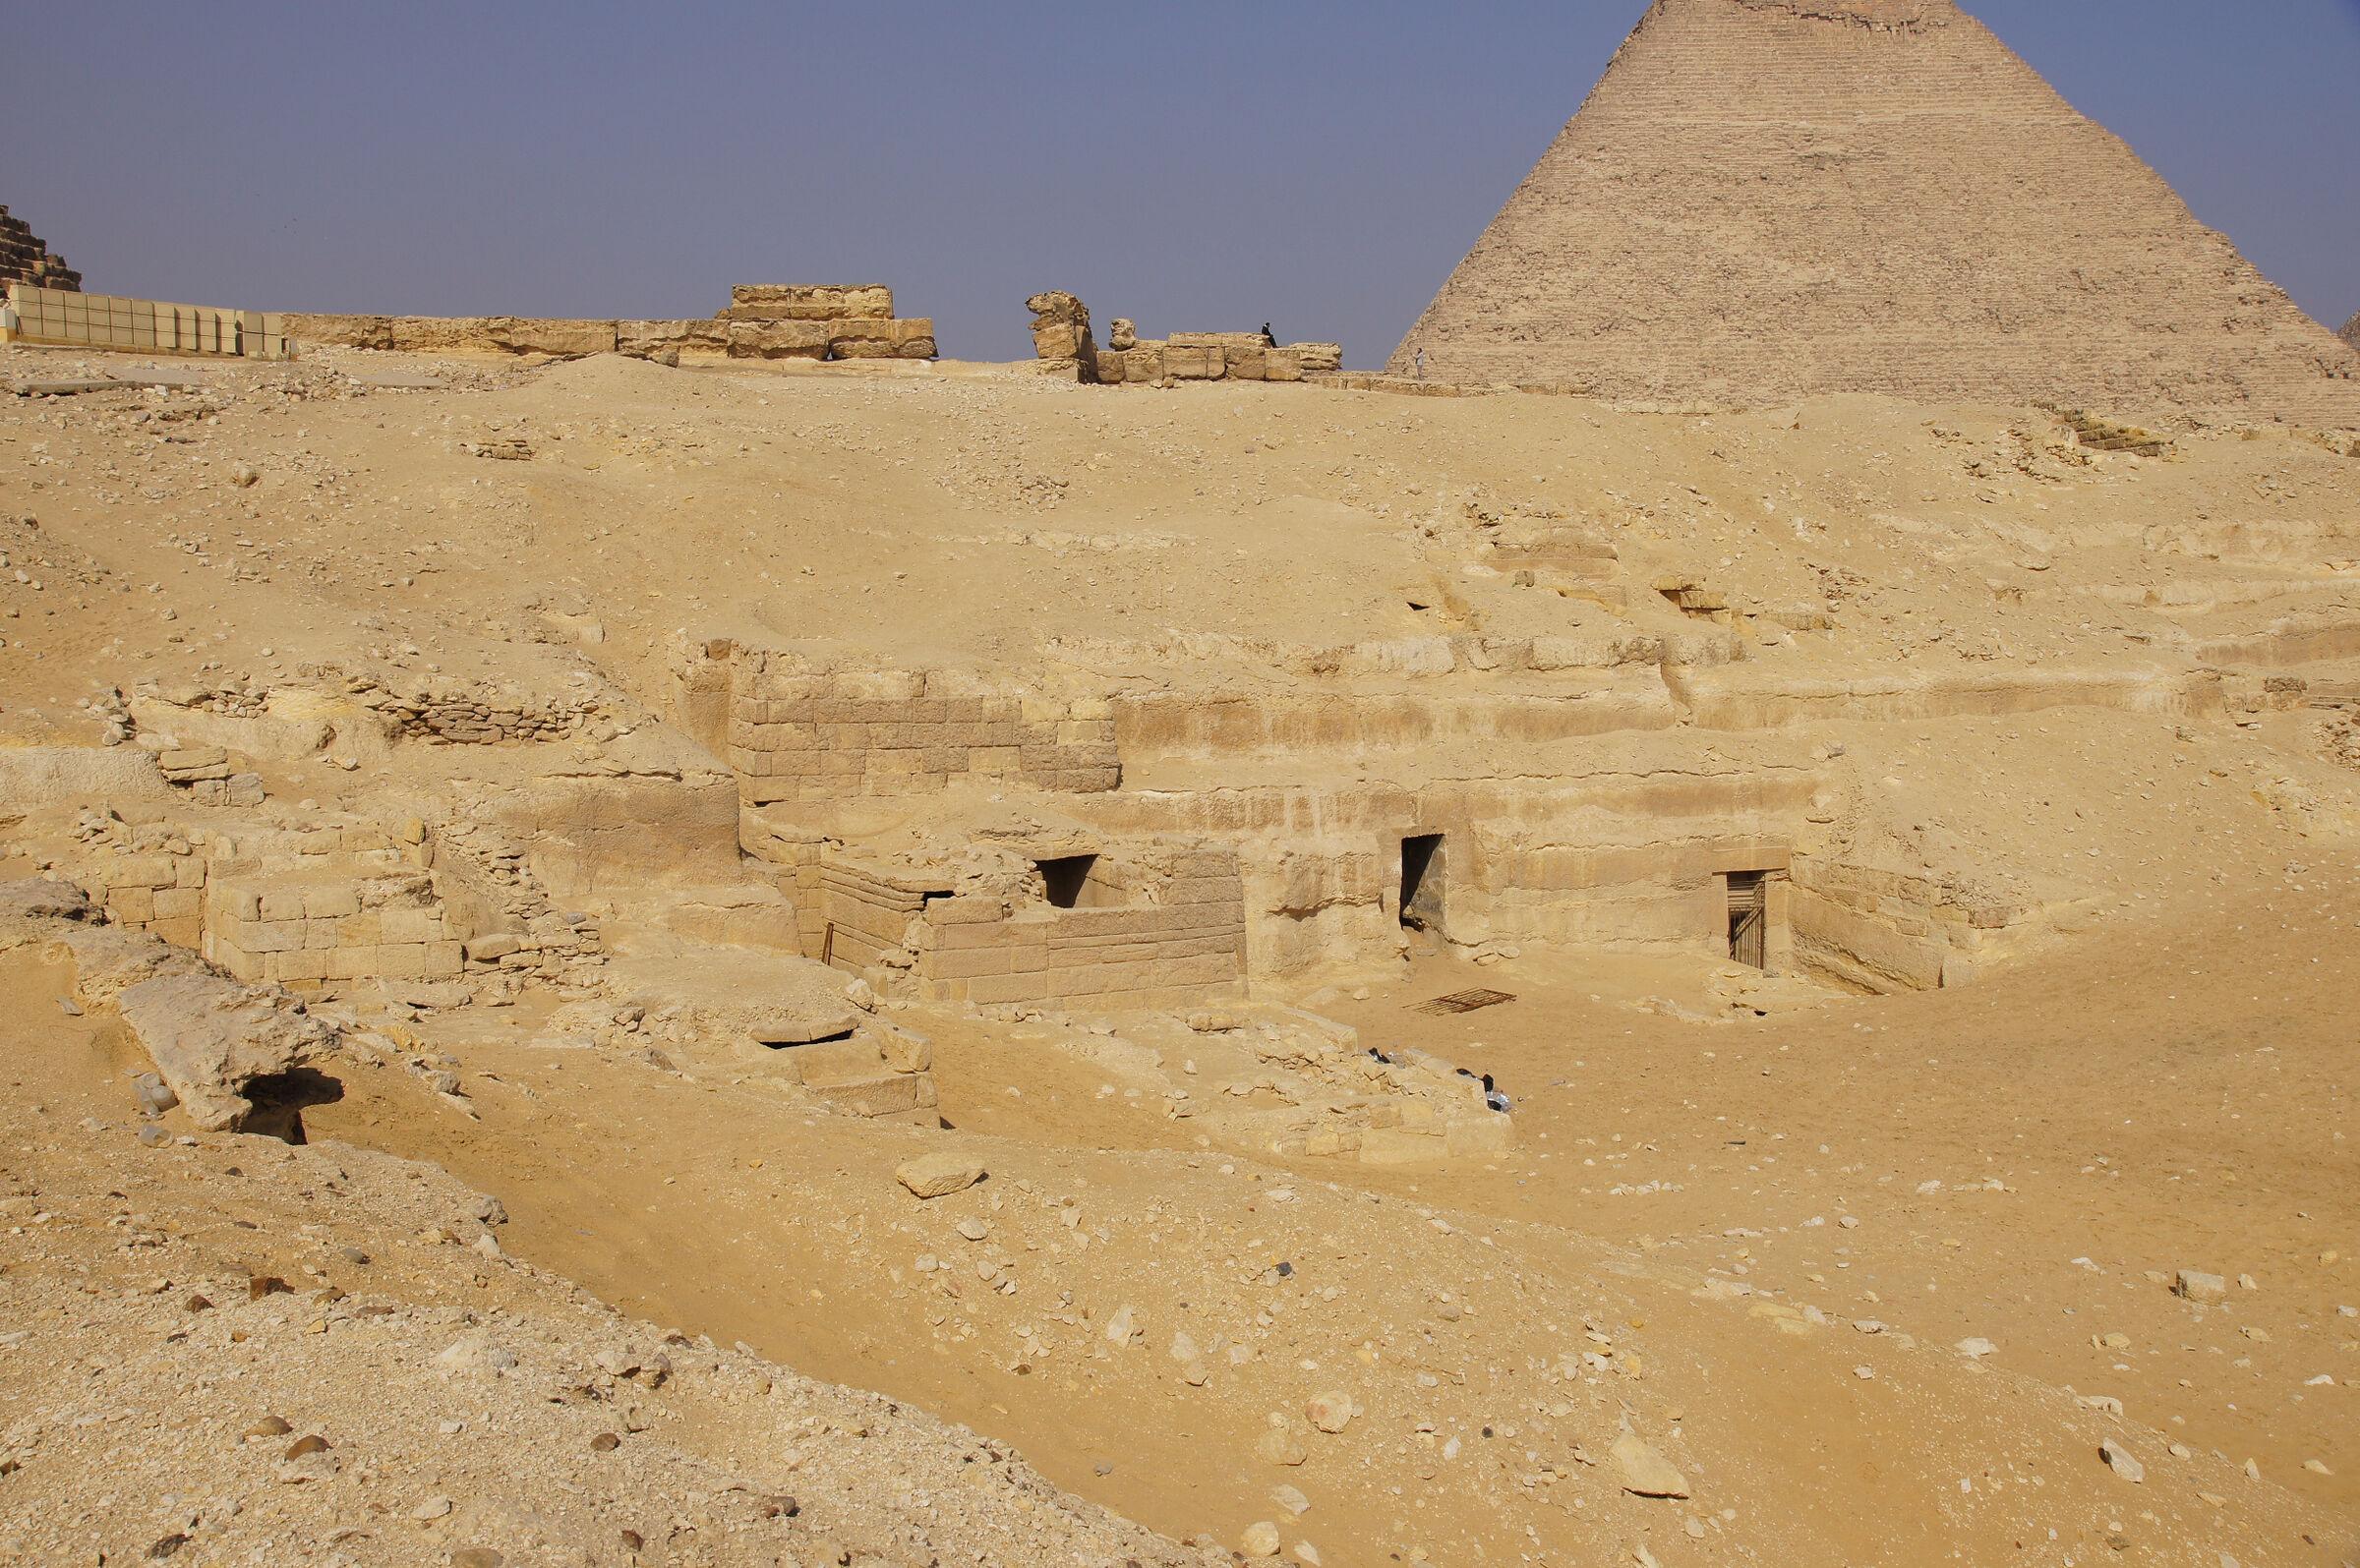 Menkaure Quarry Cemetery: Site: Giza; View: MQ 106, MQ 123, MQ 105, MQ 120, MQ 134, MQ 121, MQ 130, MQ 132, MQ 133, Khafre Pyramid